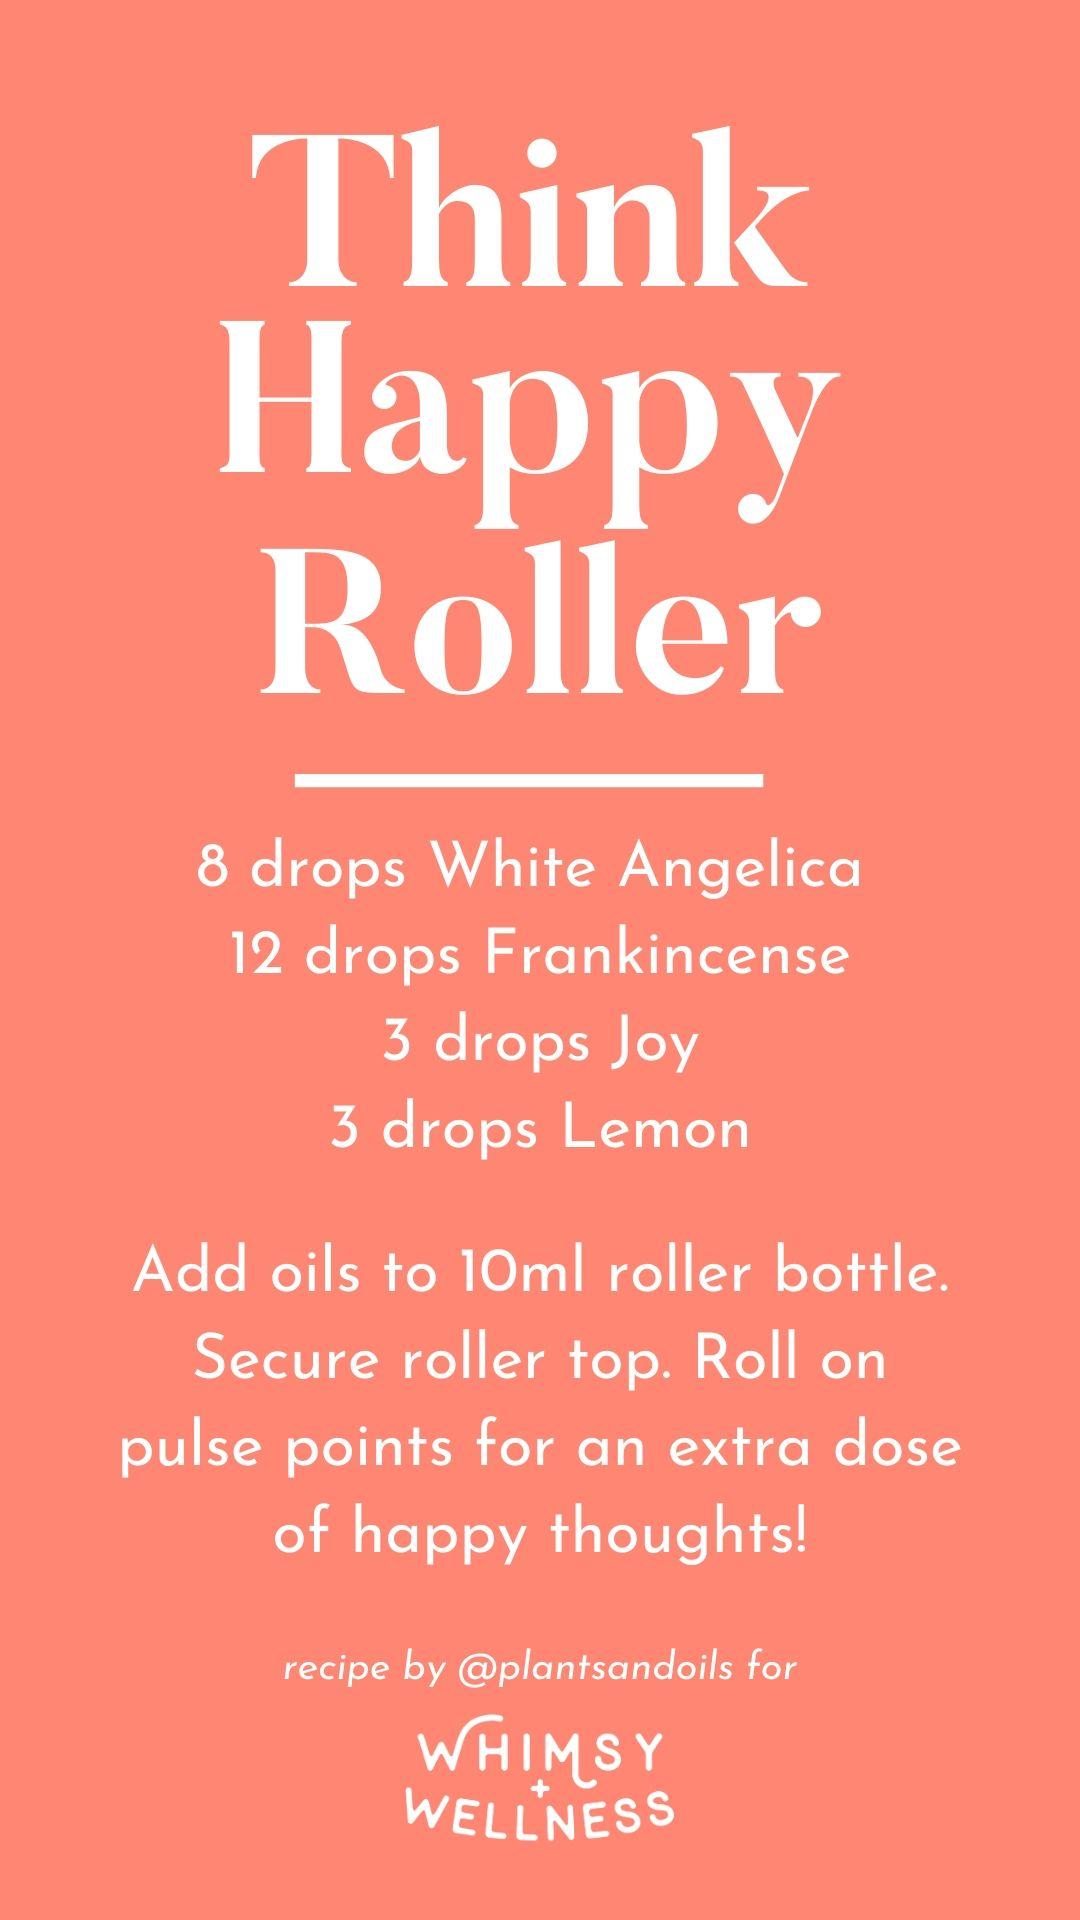 Think Happy Essential Oil Roller Karen Serrano Whimsy + Wellness